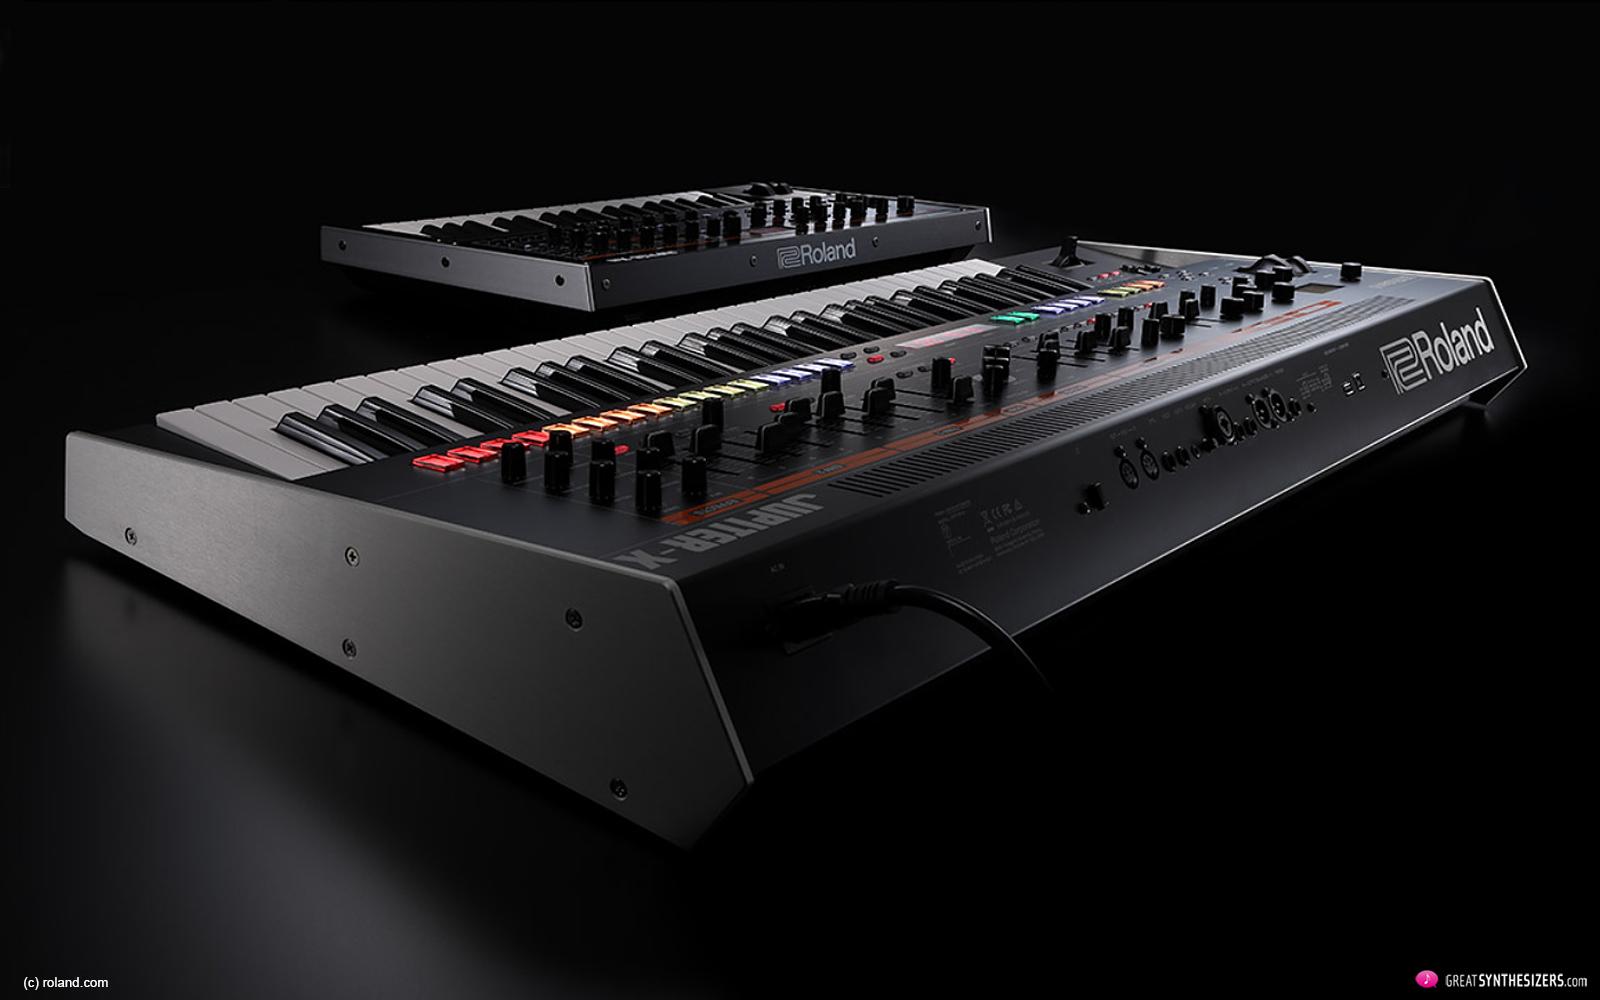 Roland's new JUPITER-X / JUPITER-Xm Synthesizers